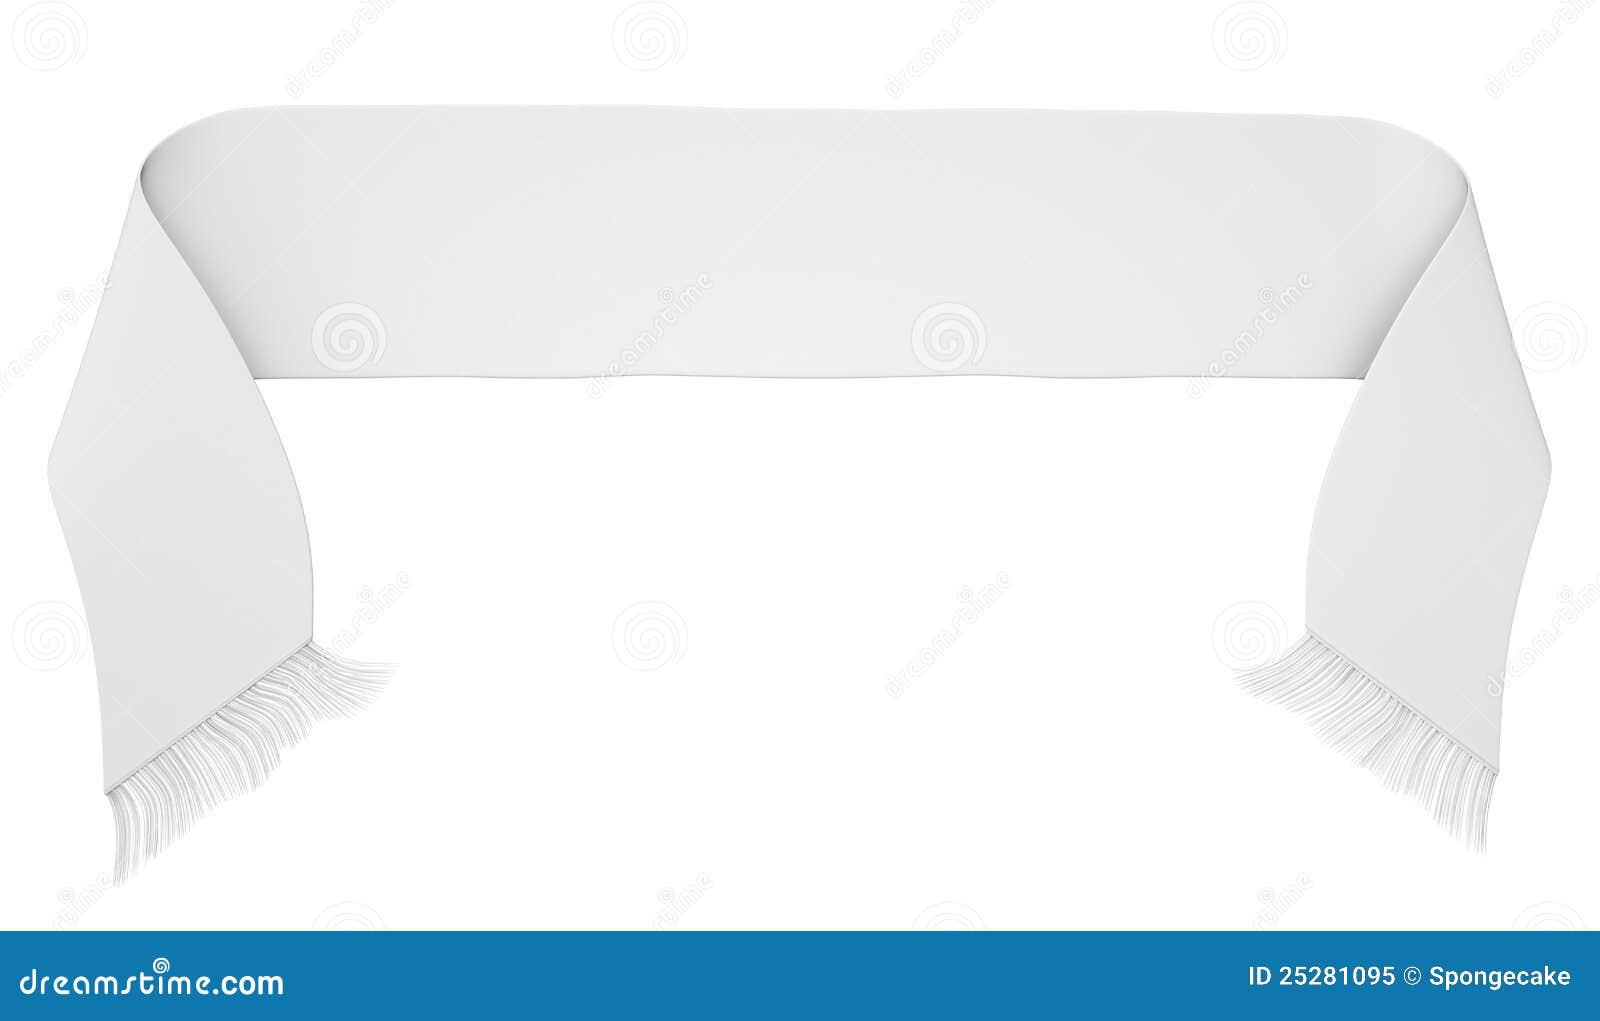 Football scarf stock illustration  Illustration of single